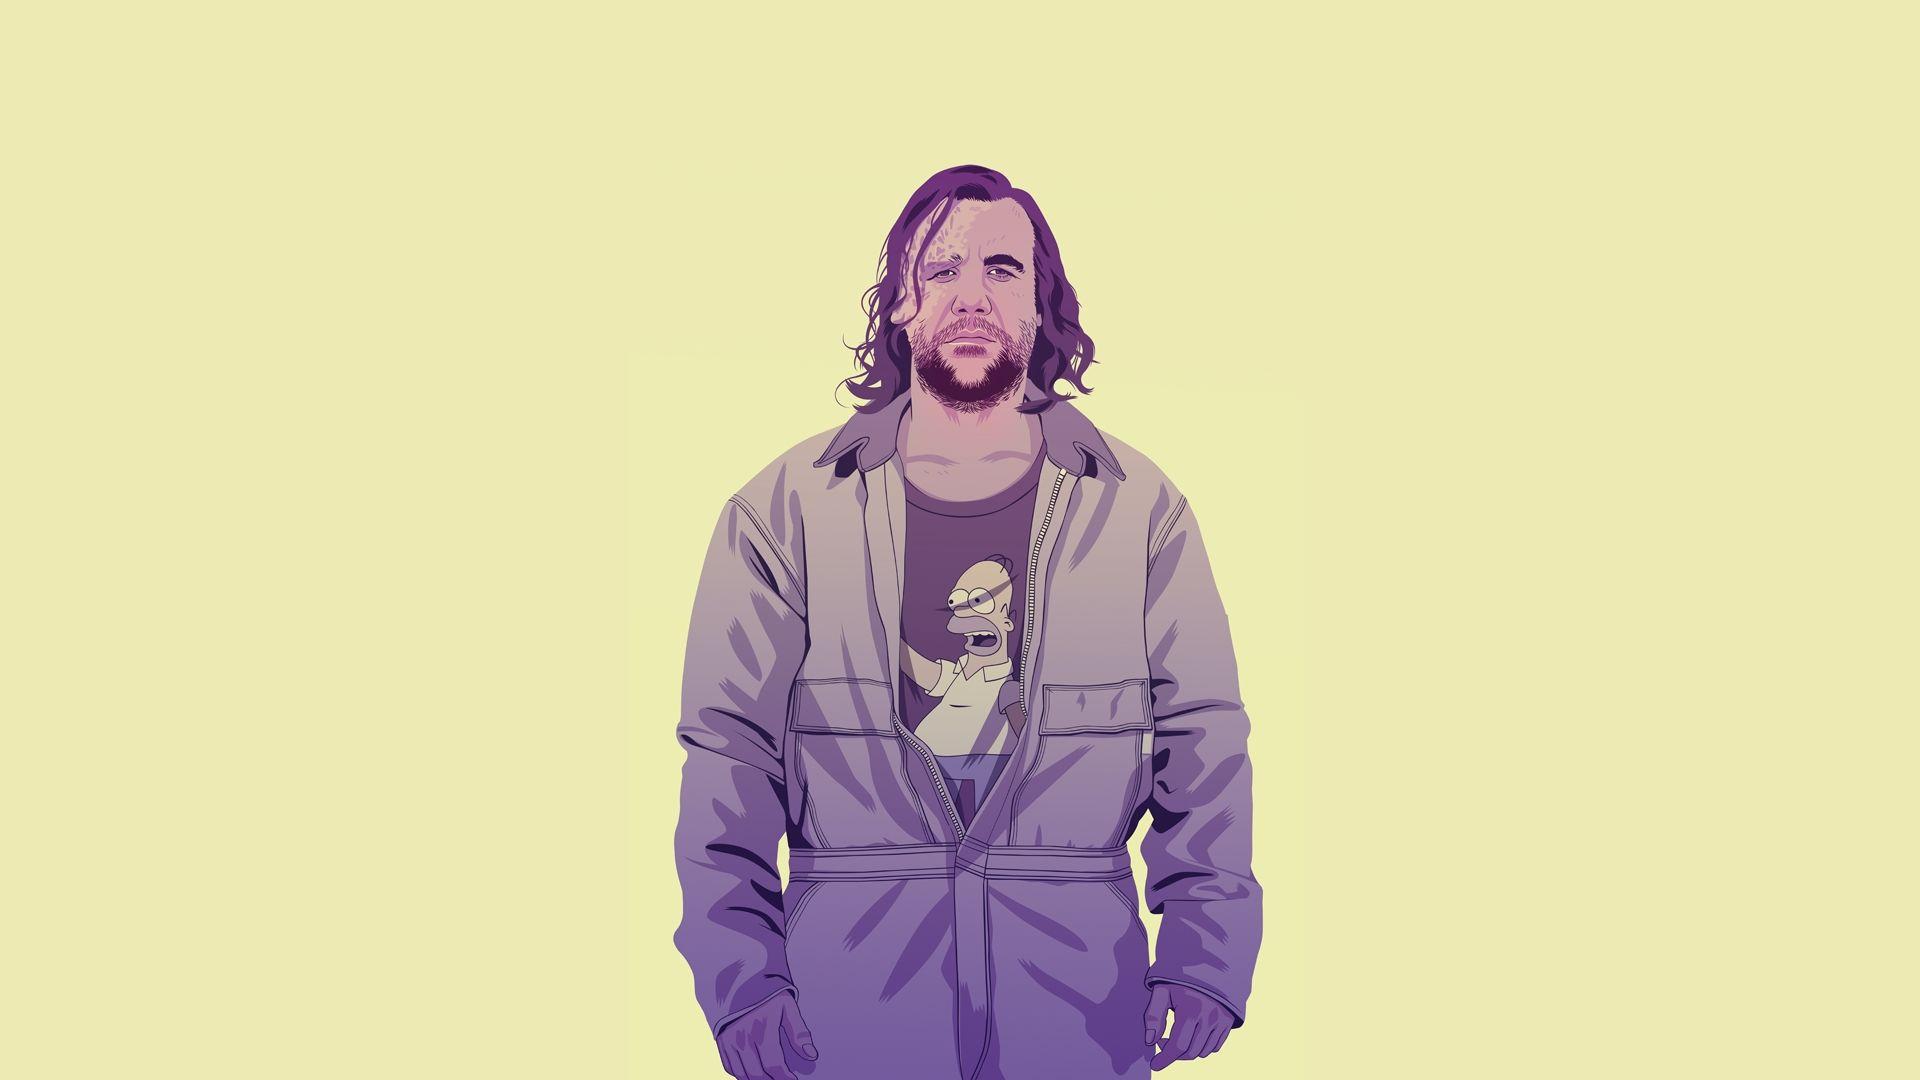 Sandor Clegane in Adidas tracksuit, illustration